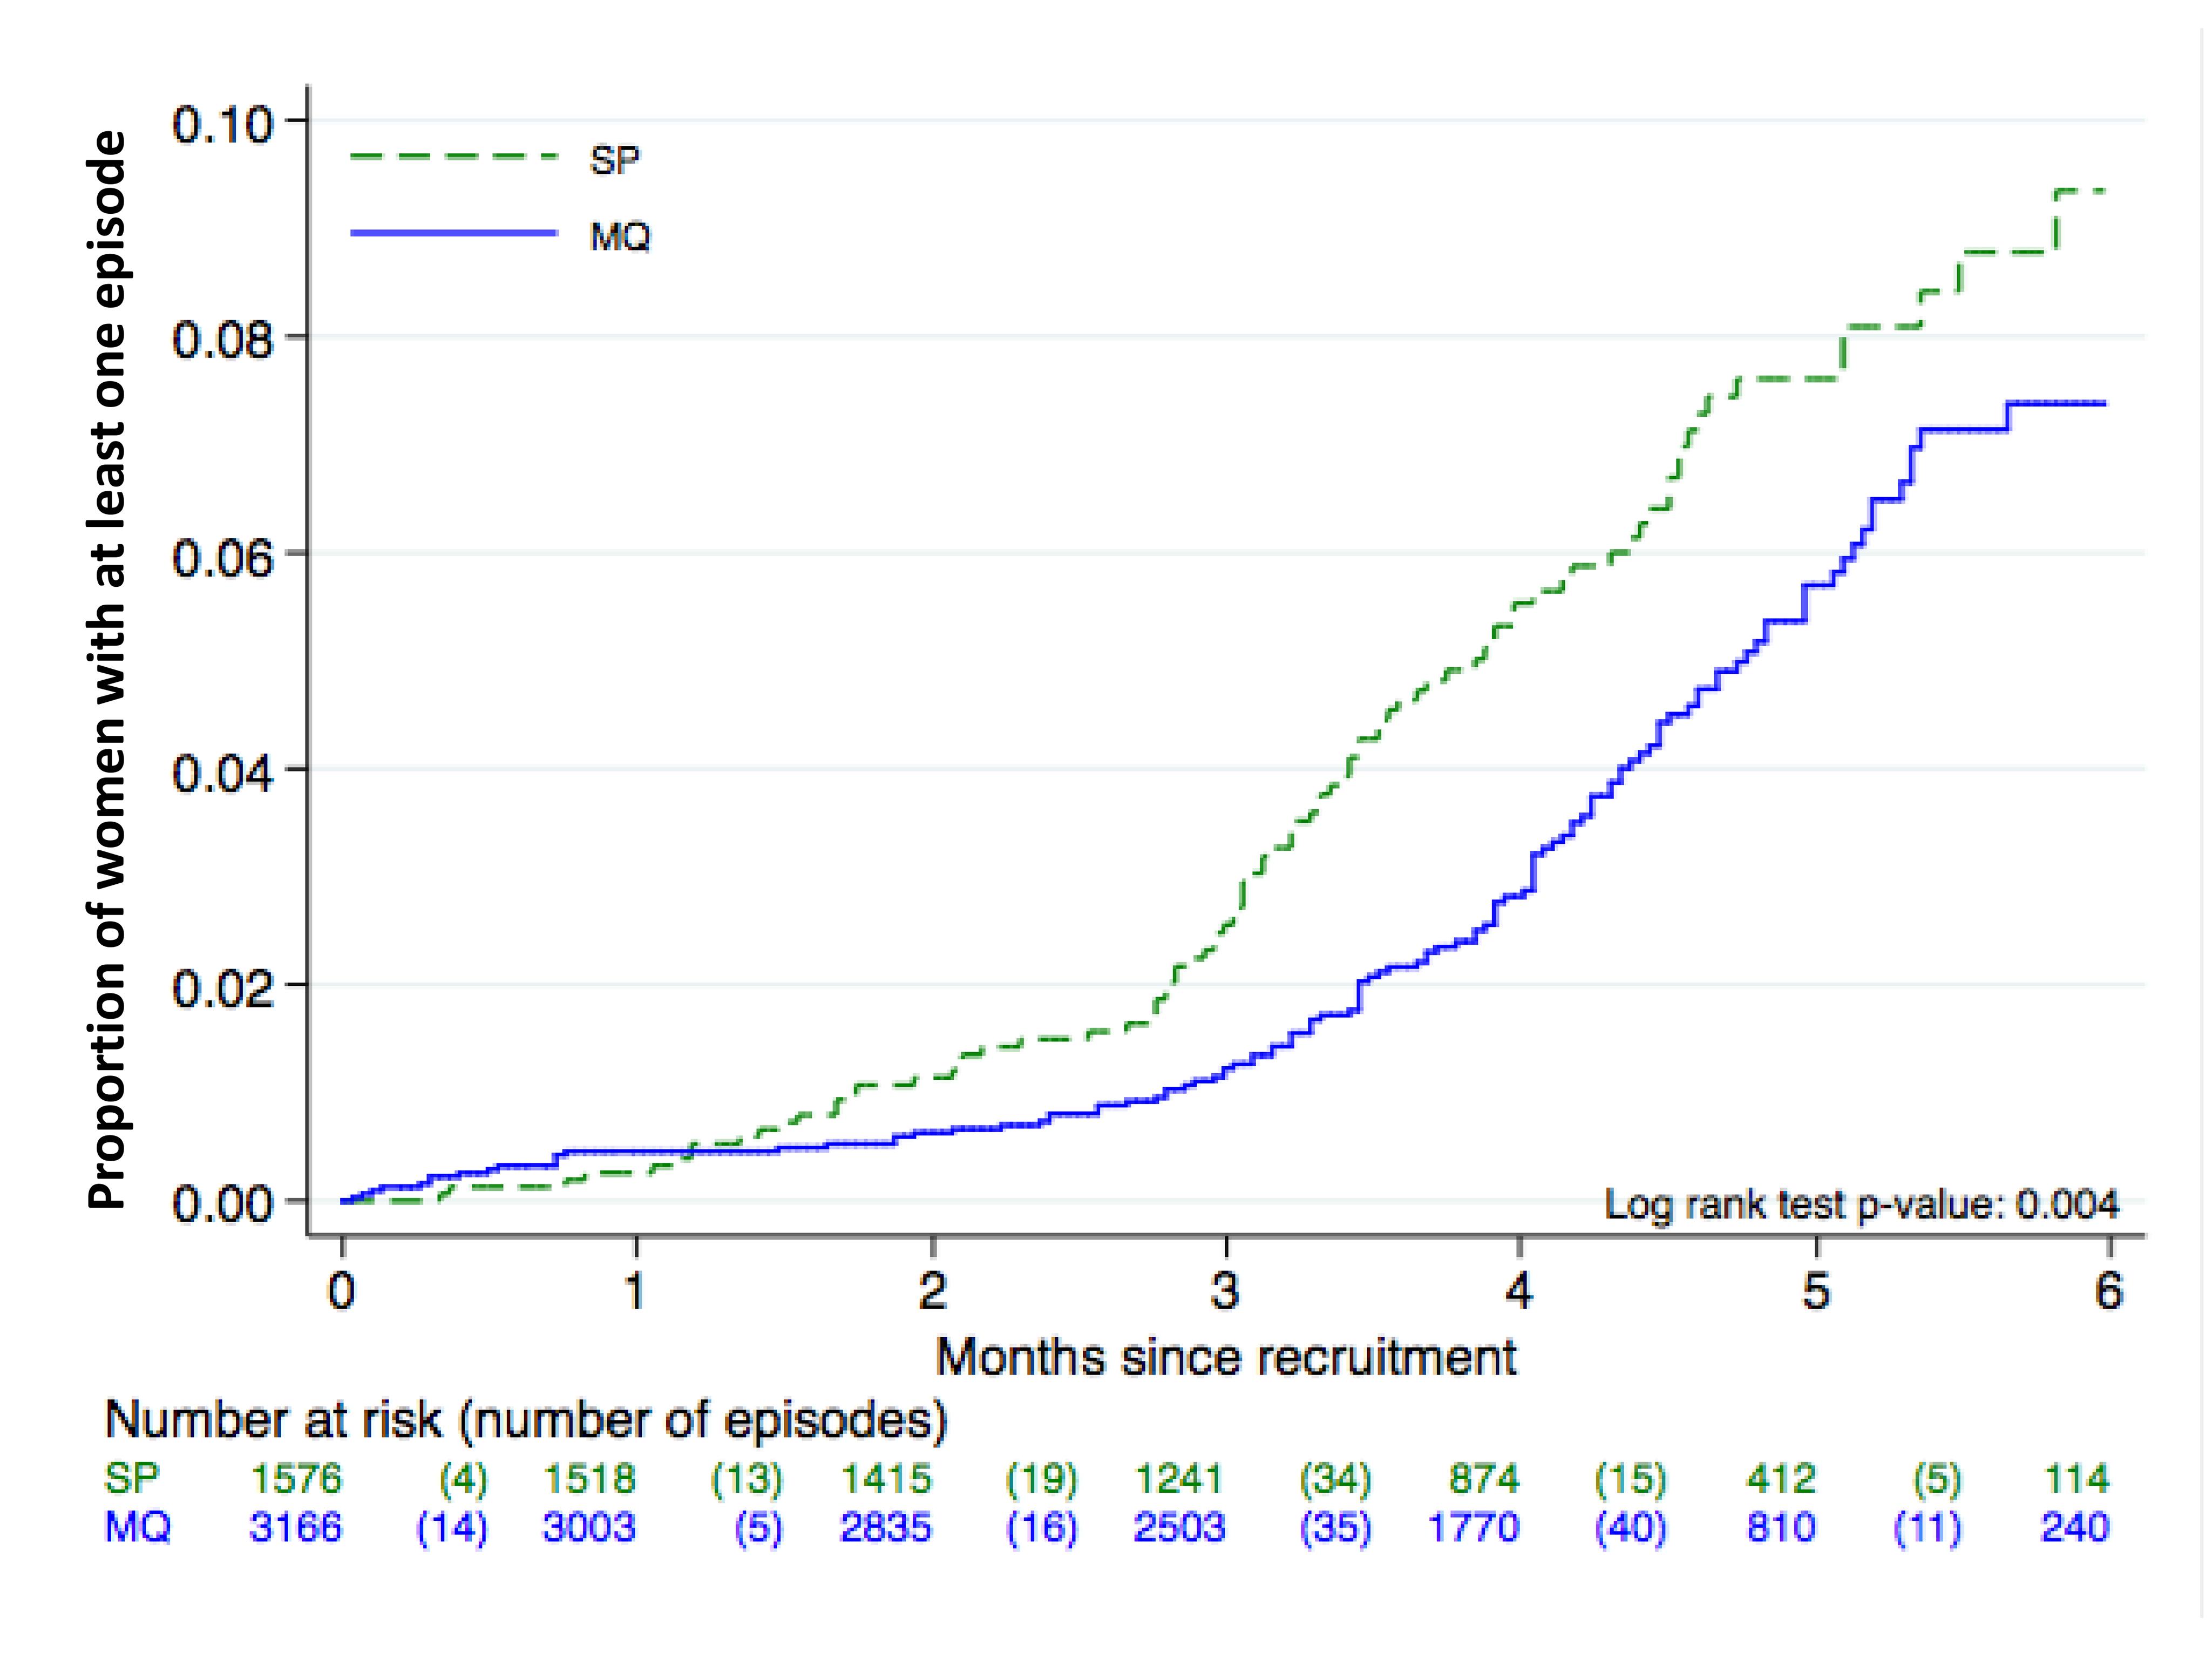 Time to first episode of clinical malaria. ITT cohort. Kaplan Meier graph.